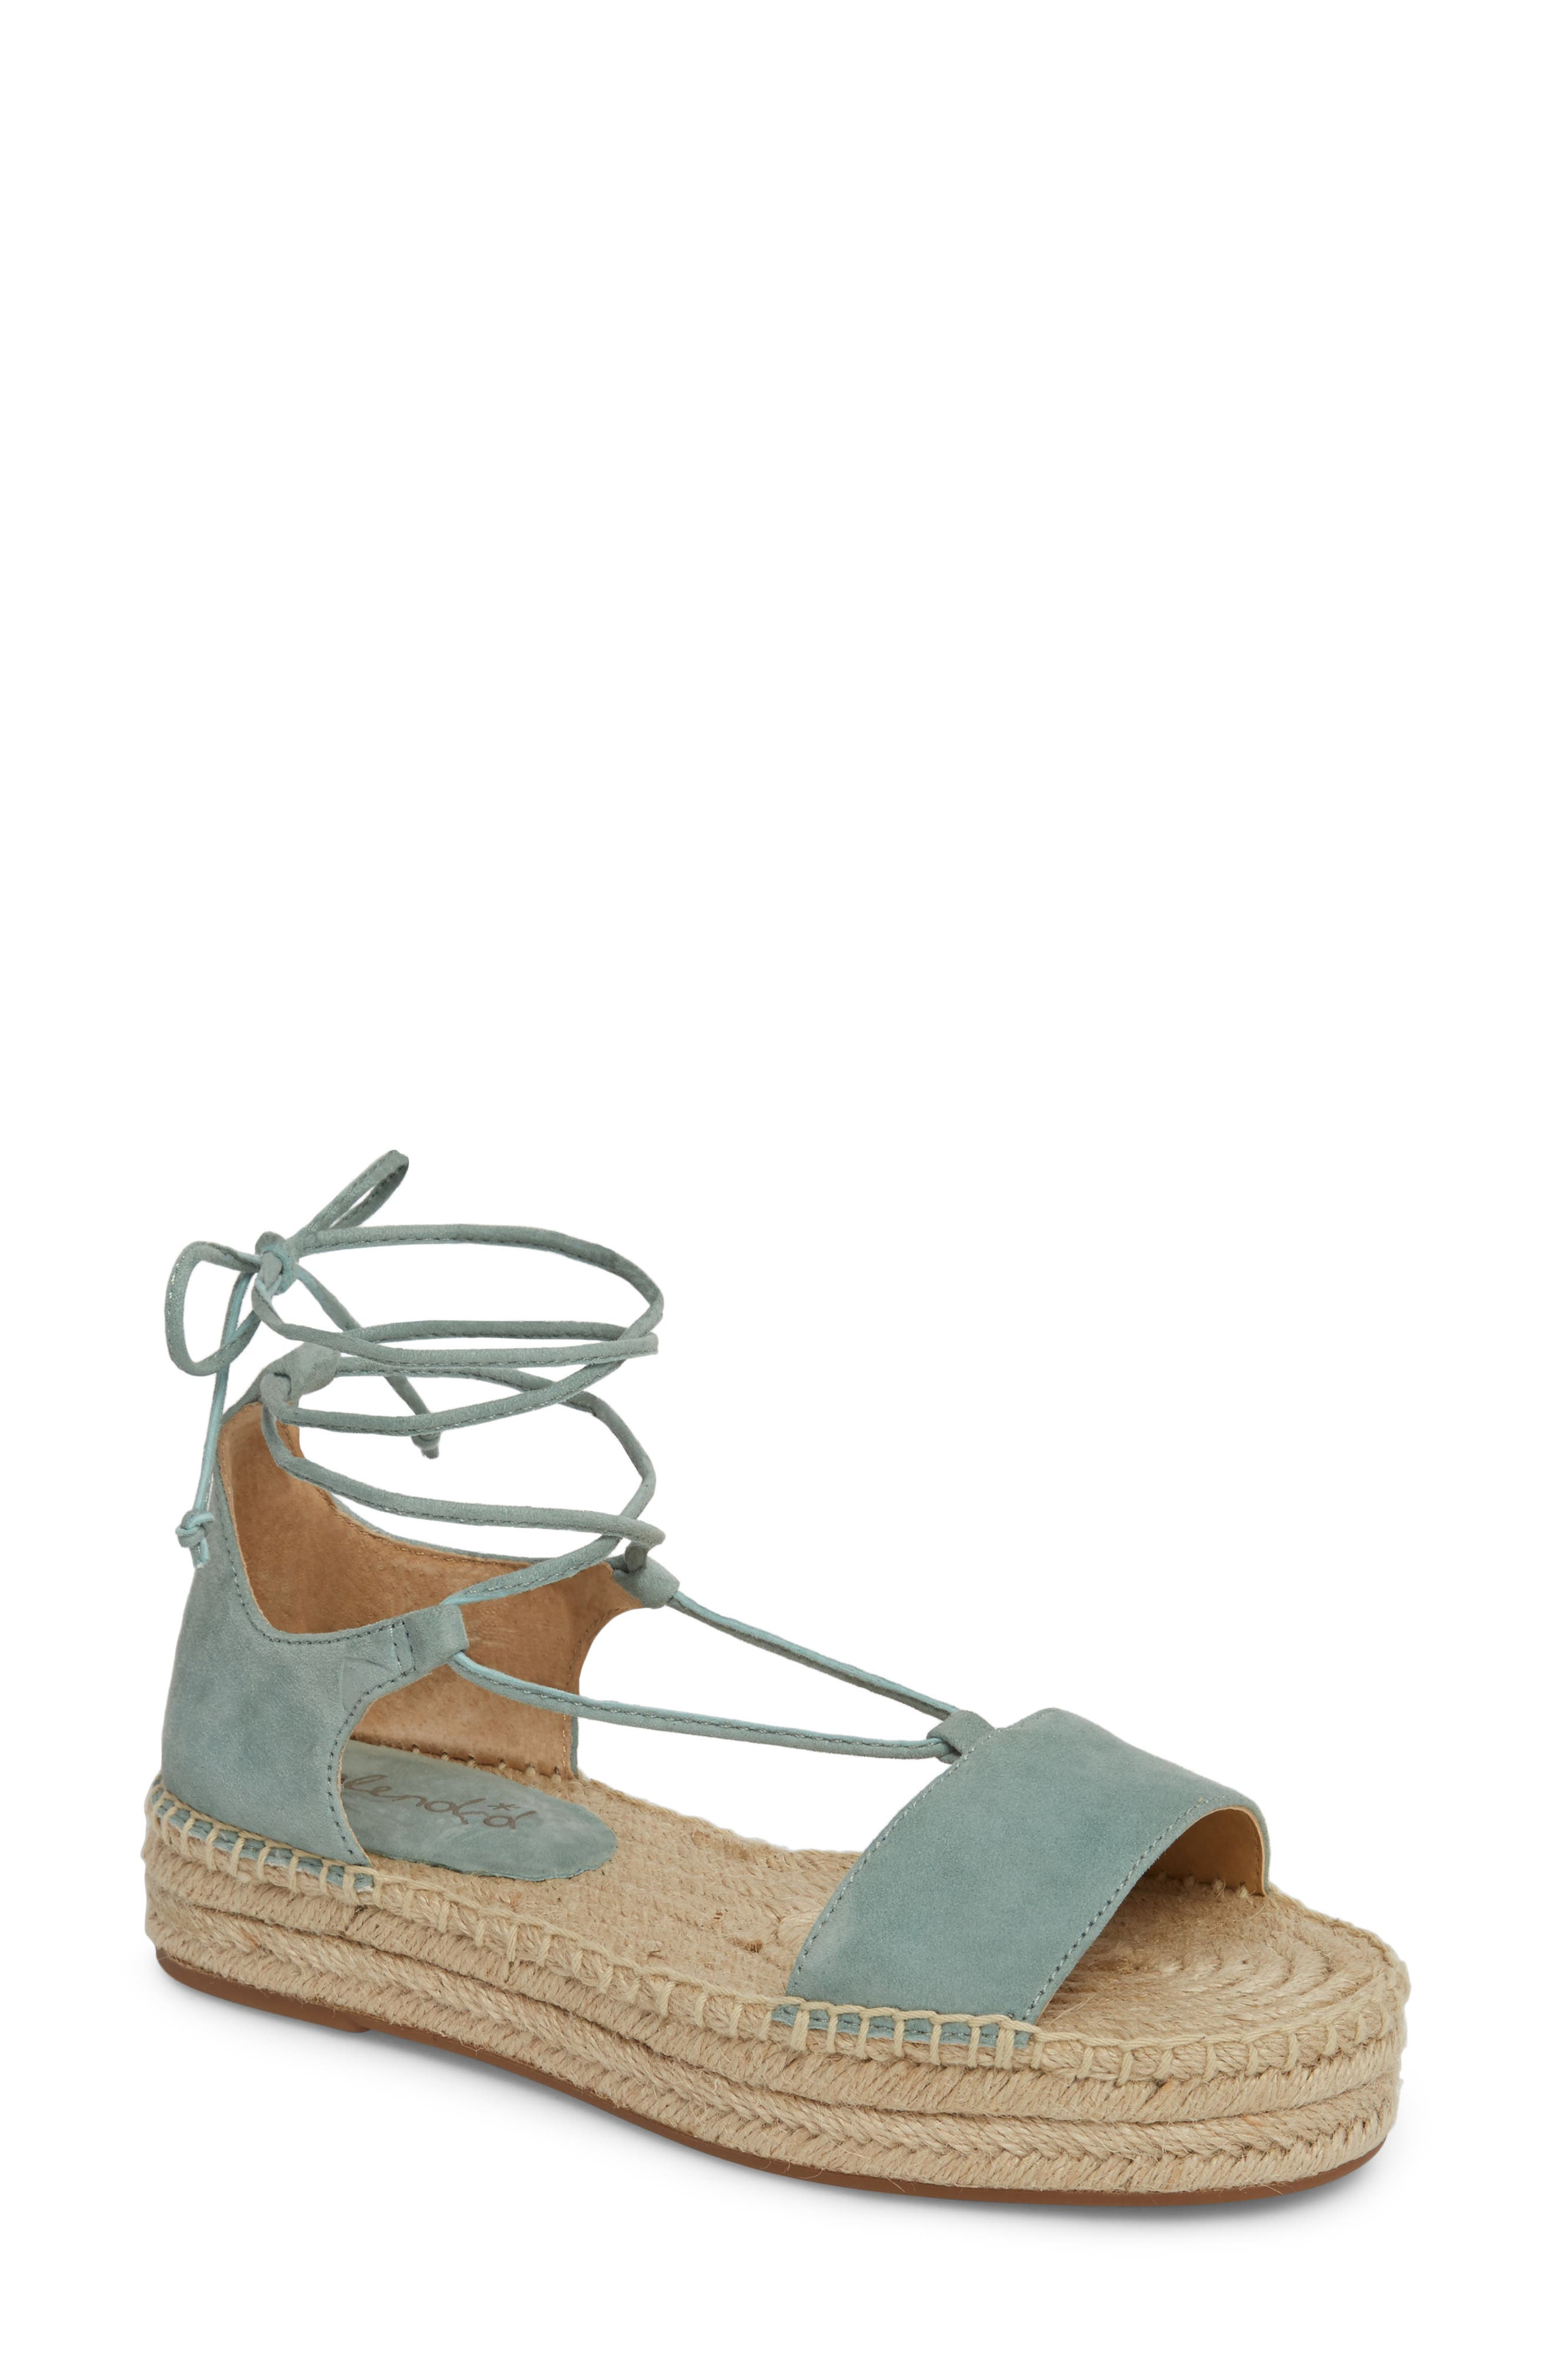 Splendid Fernanda Wraparound Platform Sandal- Green